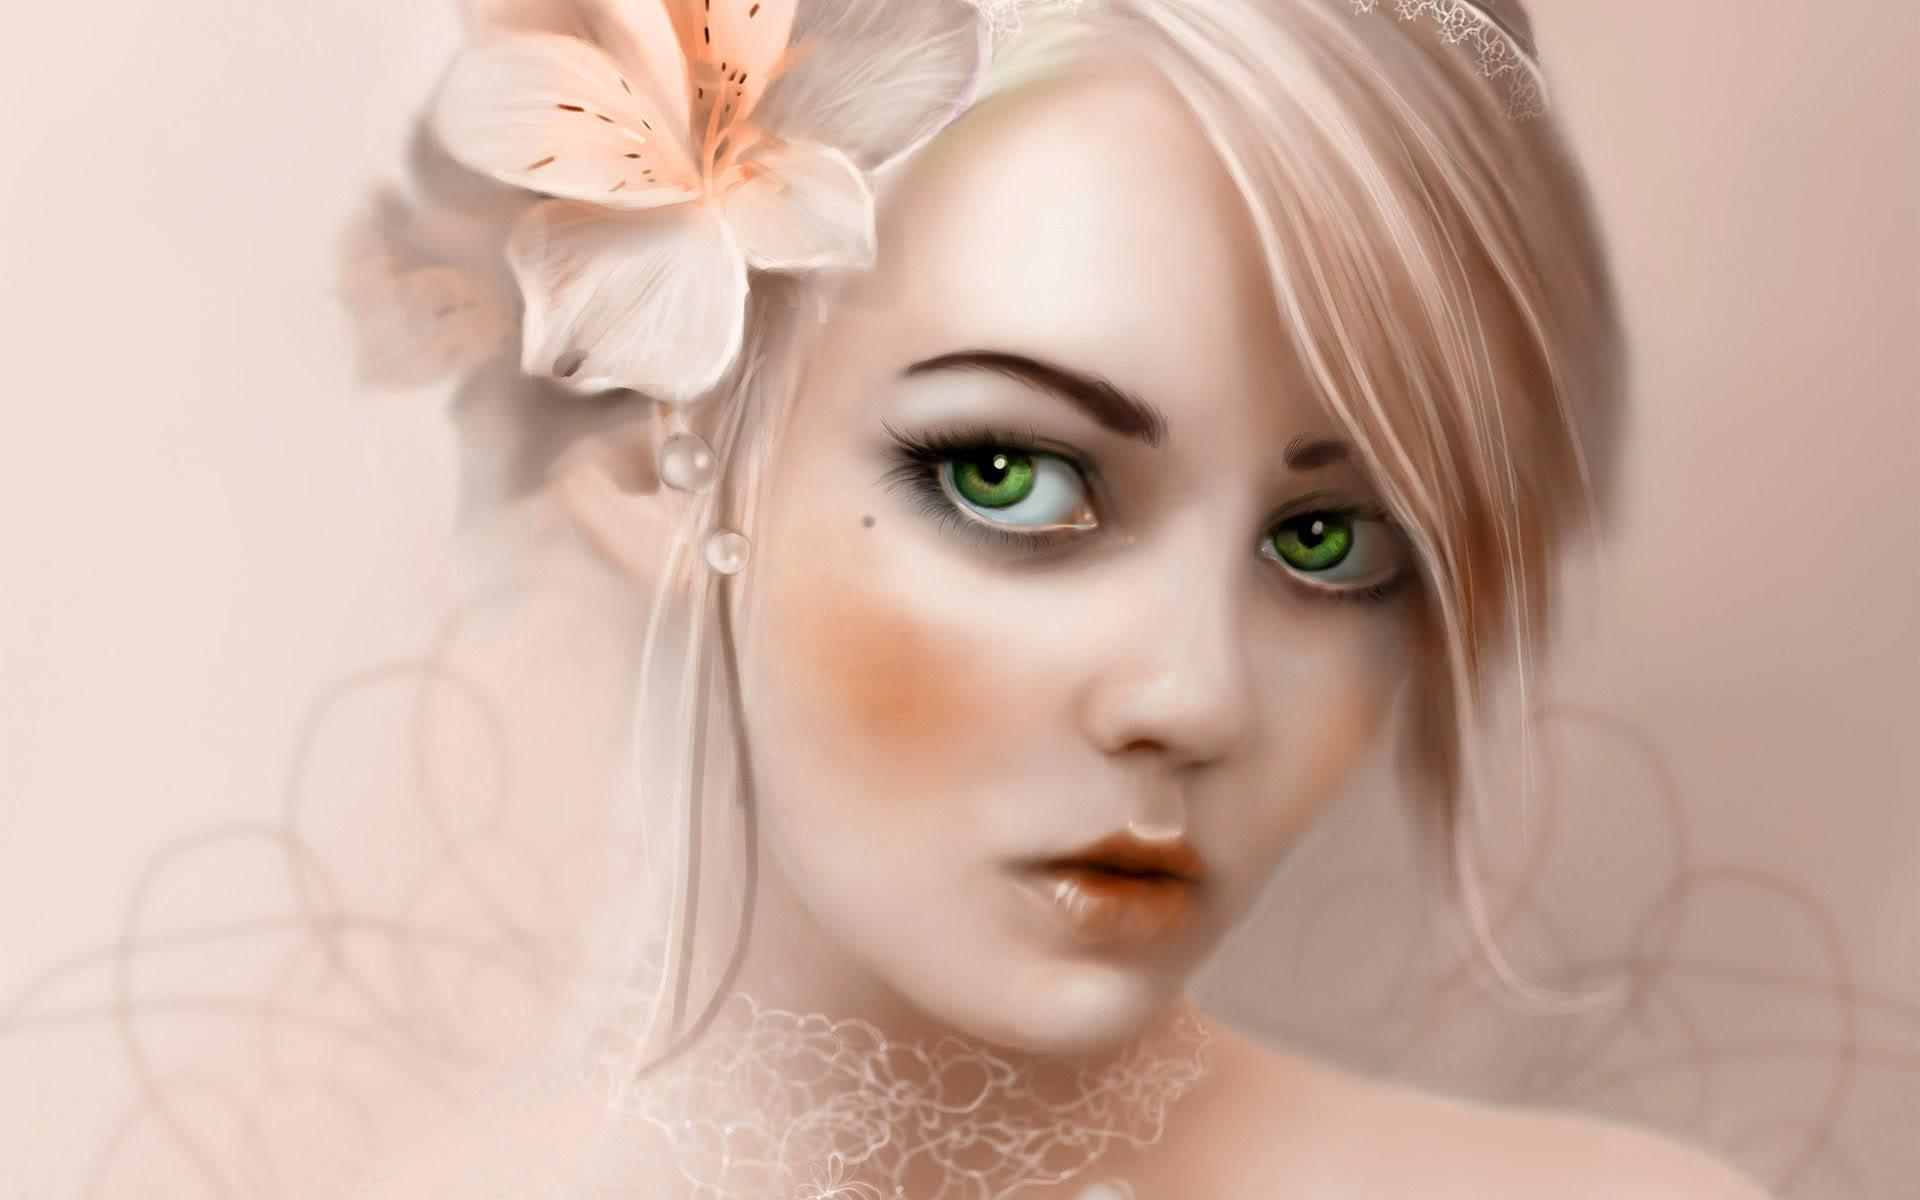 Blonde Hair Green Eyes Girl Hd Wallpaper